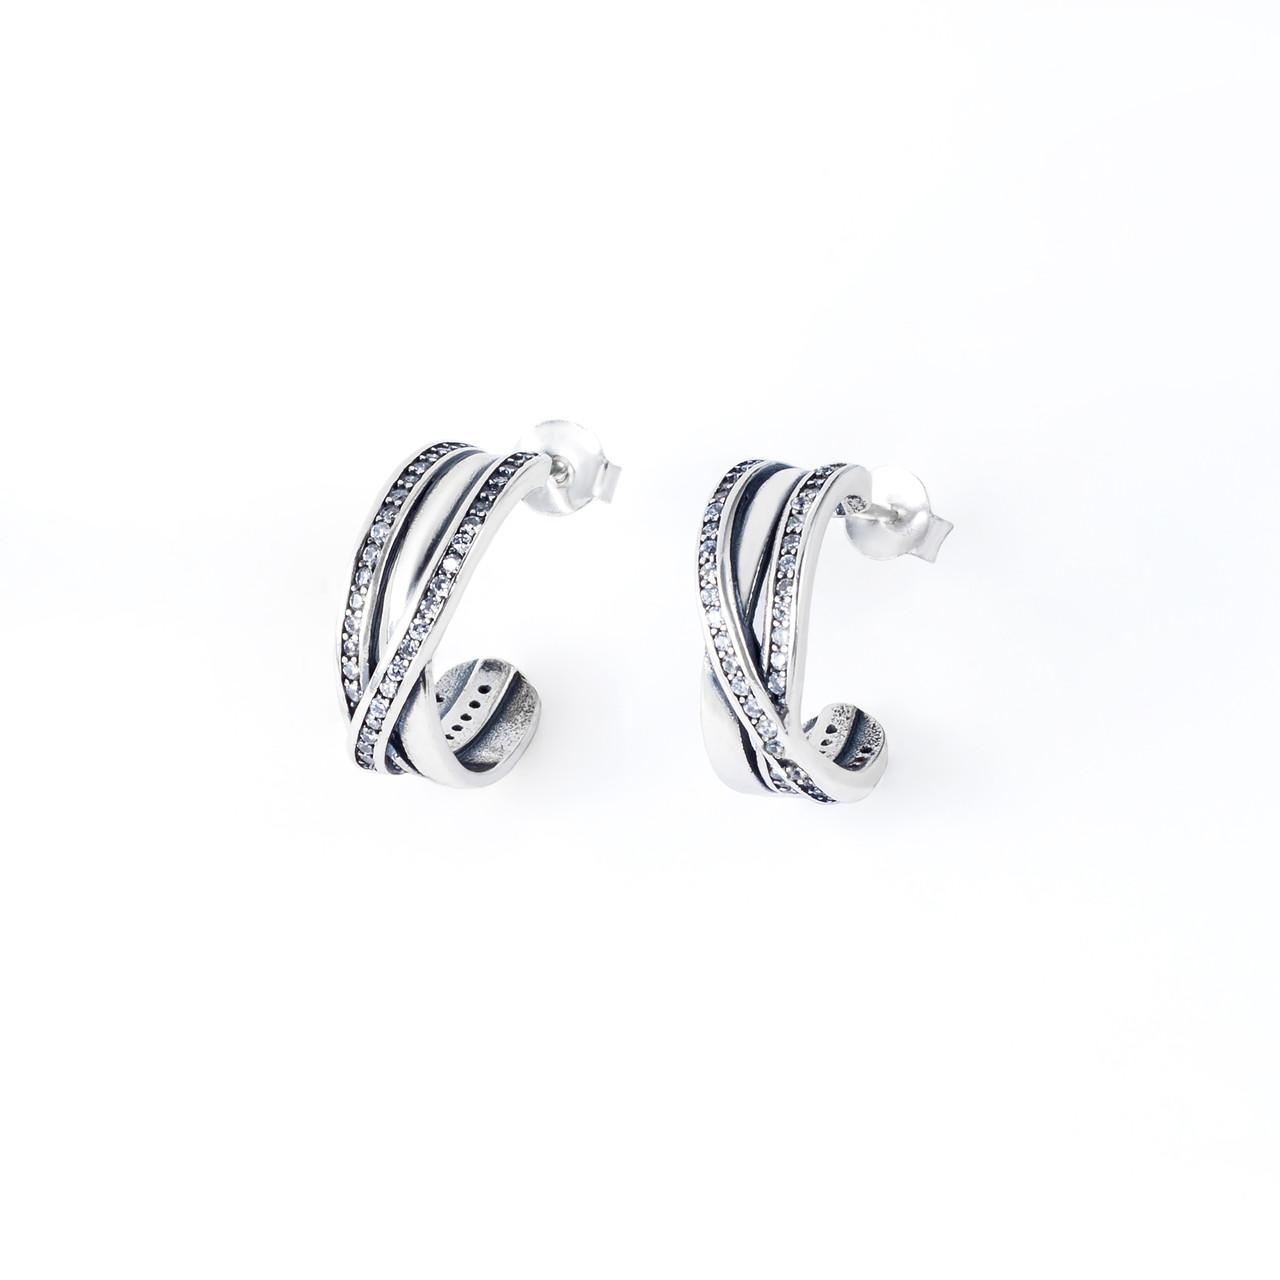 Сережки TOP Silver 4,65 г 9520254б